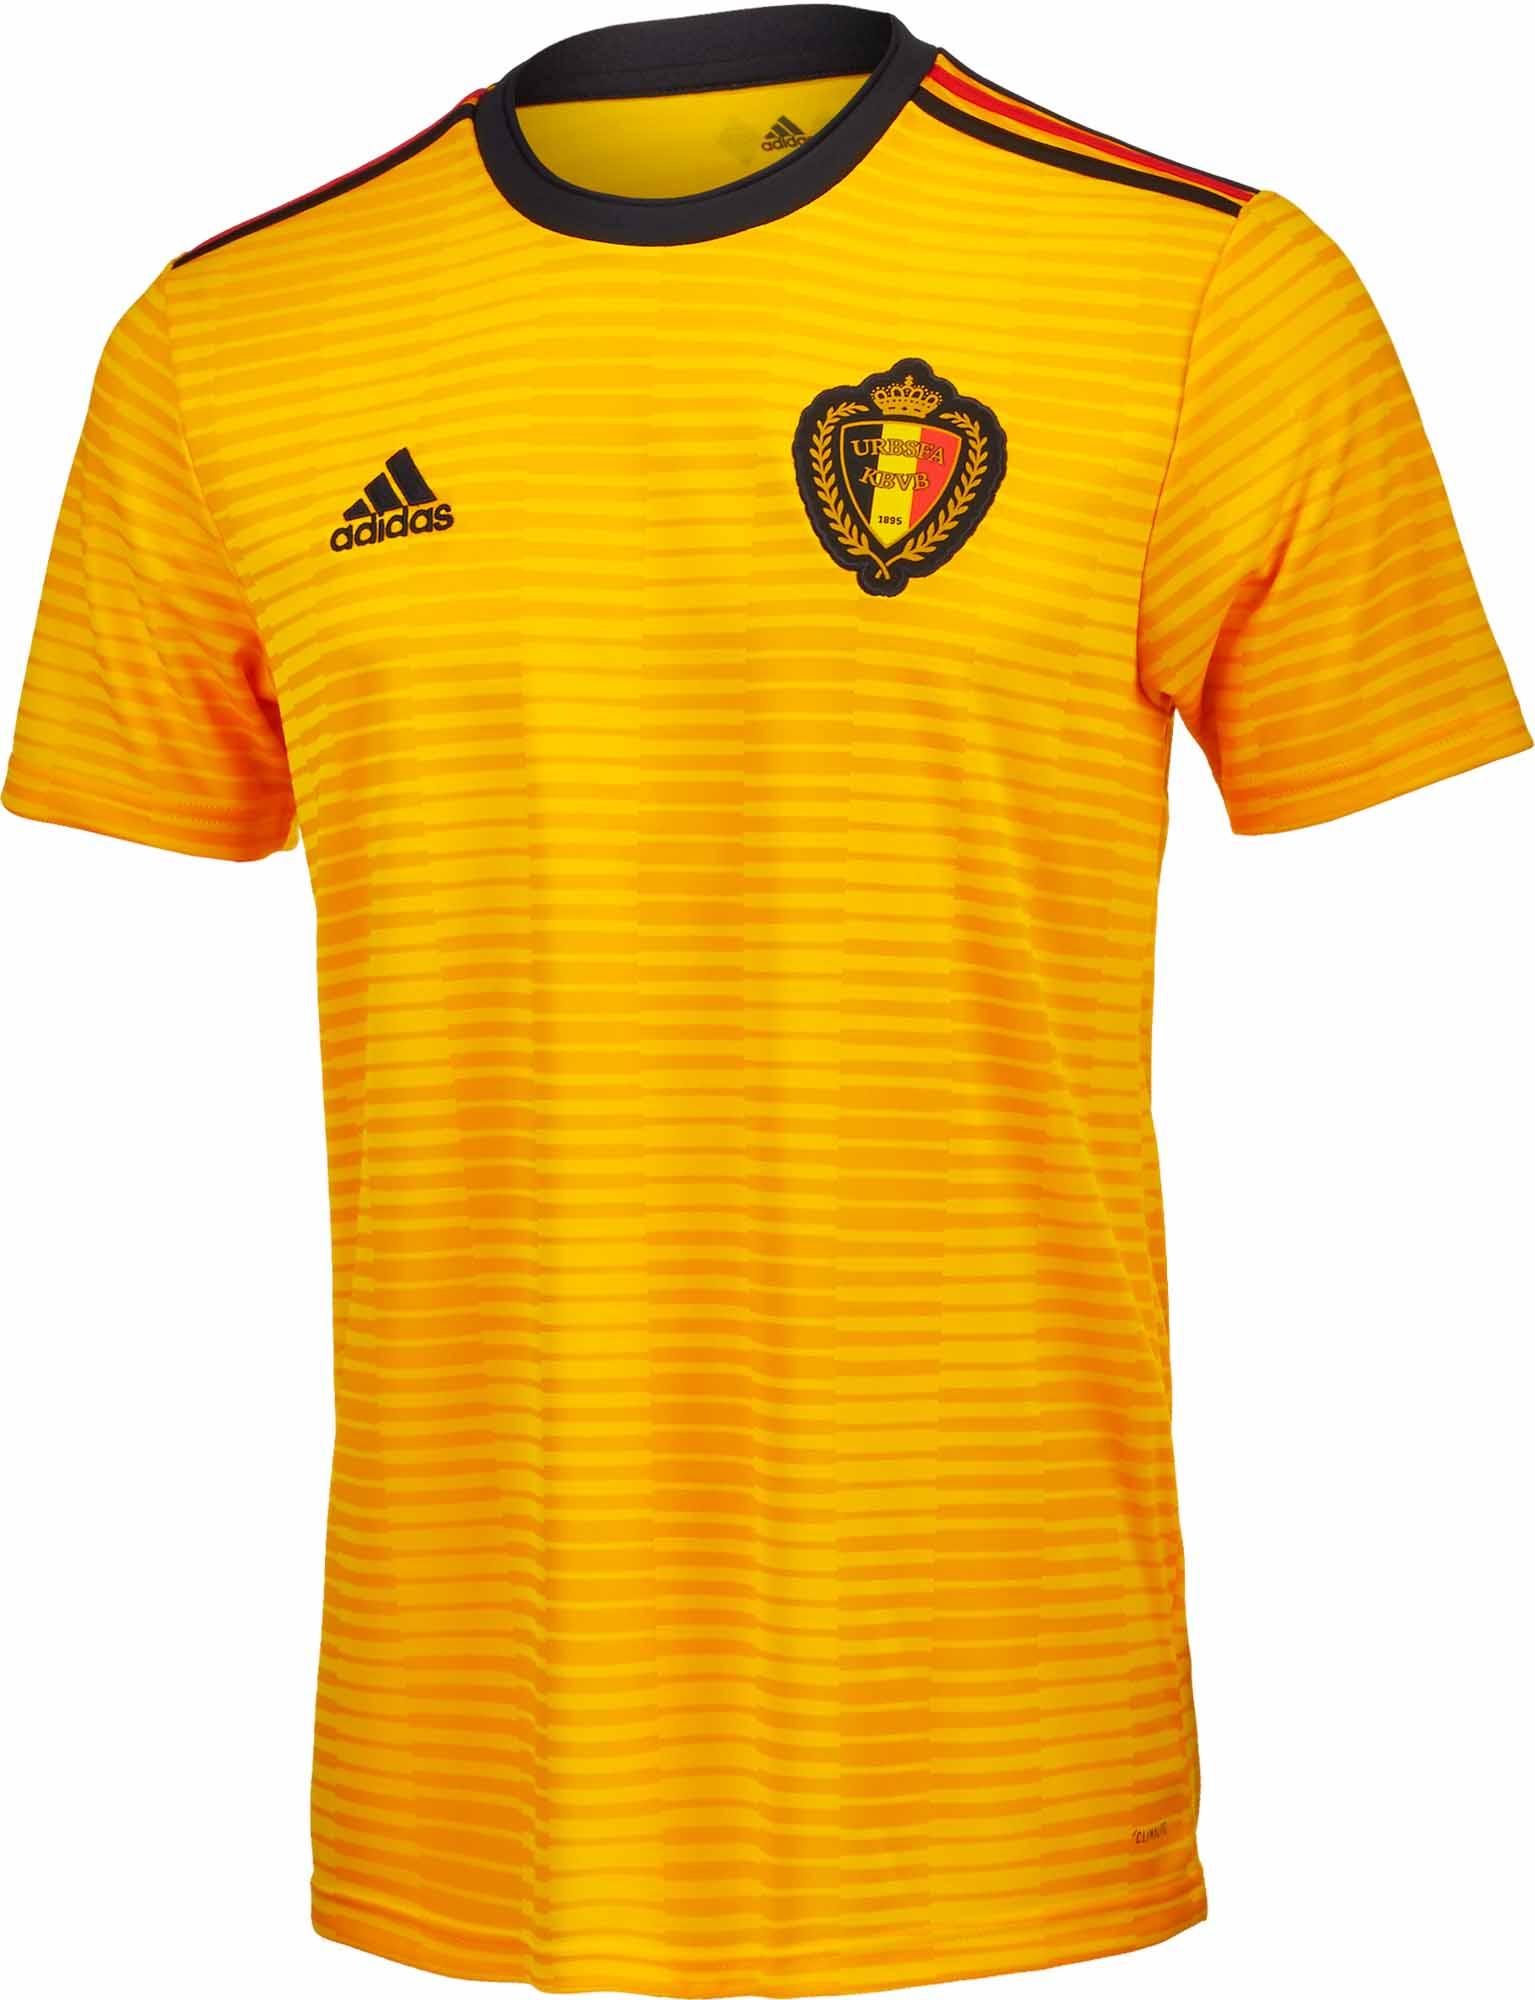 053cd12a328 adidas Belgium Away Jersey 2018-19 - SoccerPro.com